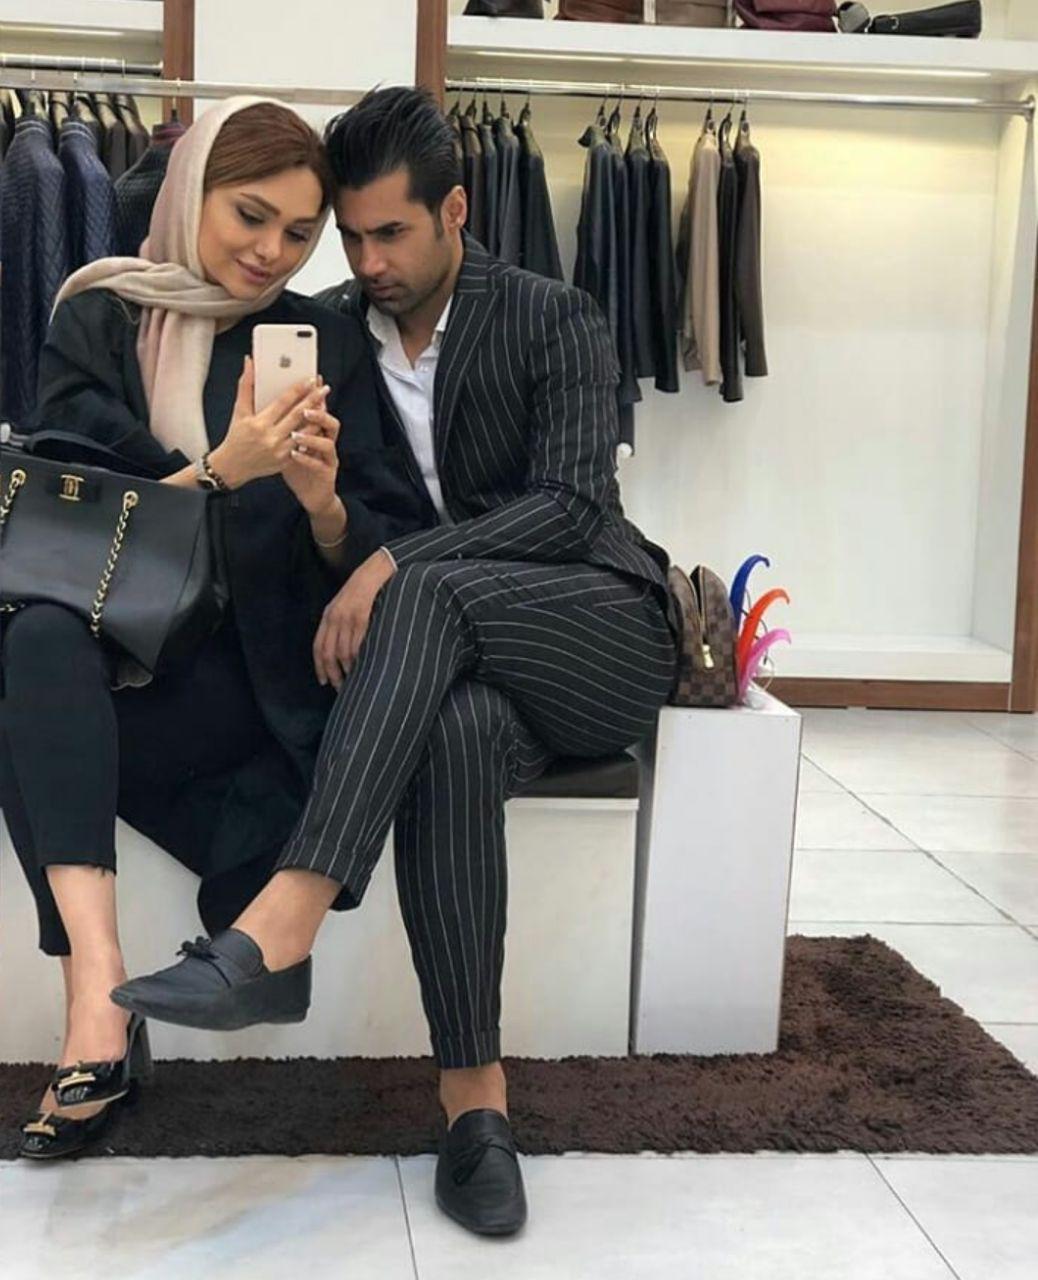 محسن فروزان و همسرش